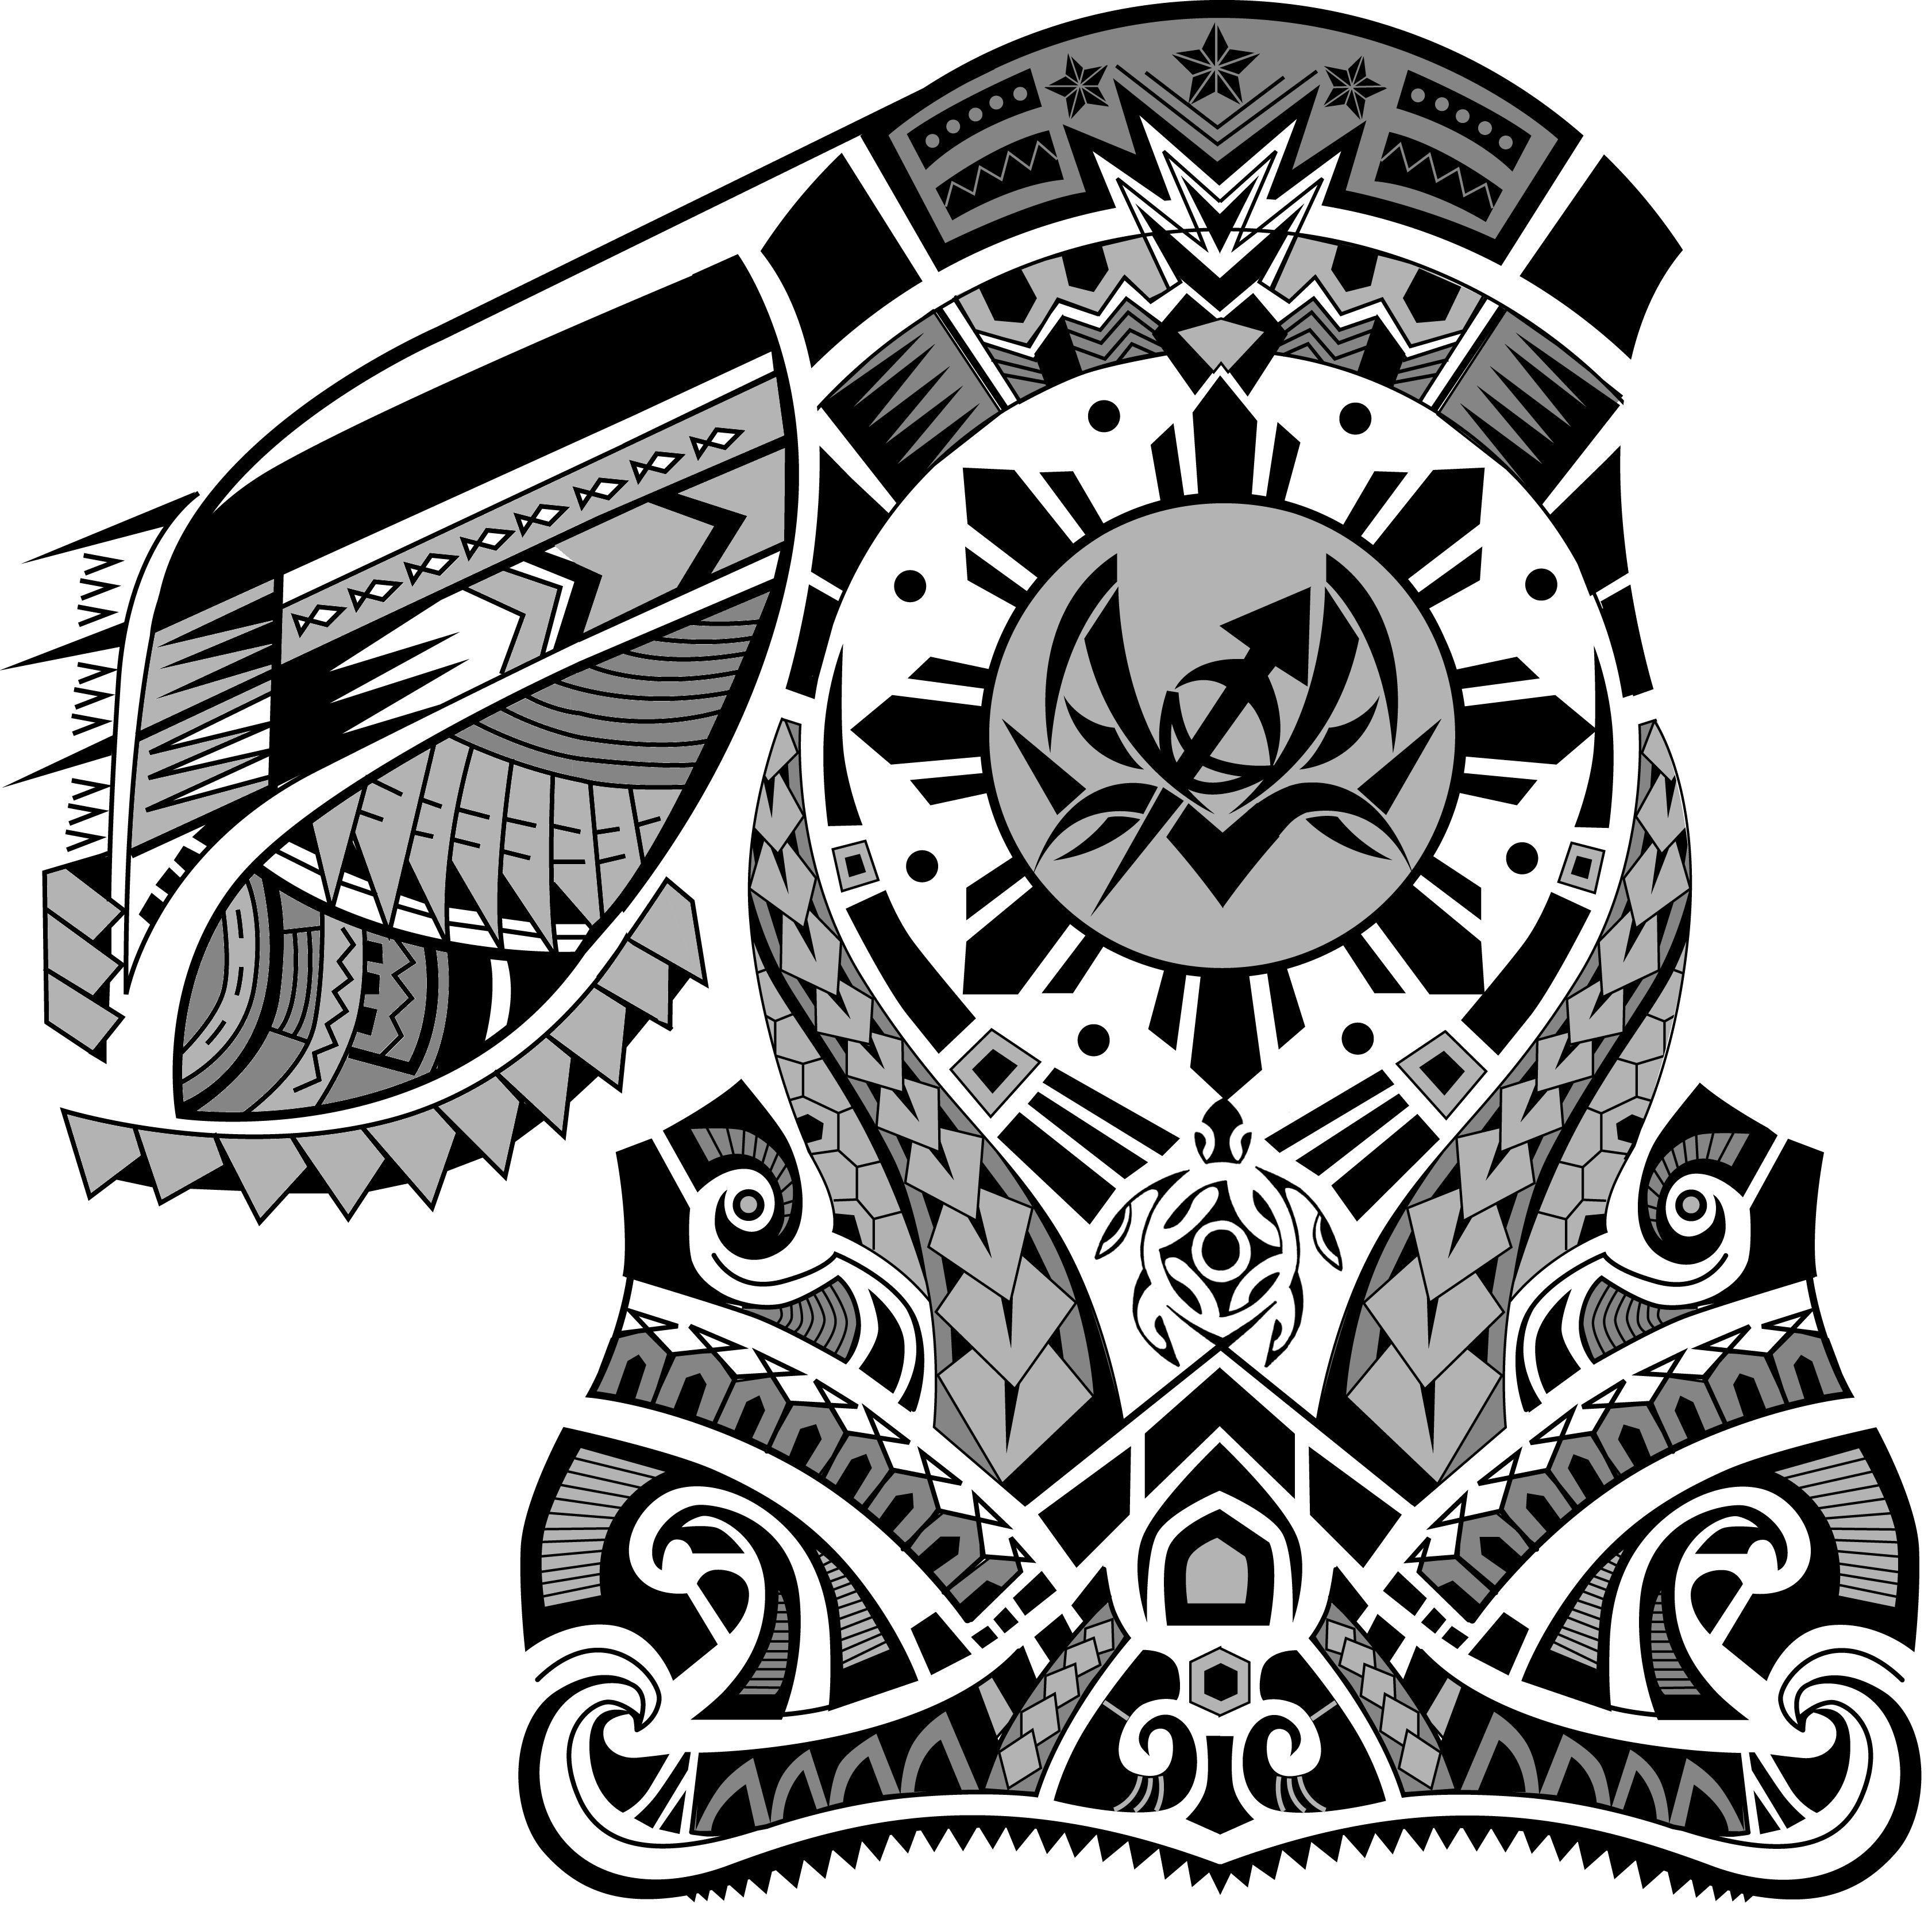 Polynesian Chest Half Sleeve Tattoo Design Designer Andrija Protic Half Sleeve Tattoos Designs Maori Tattoo Designs Full Sleeve Tattoo Design